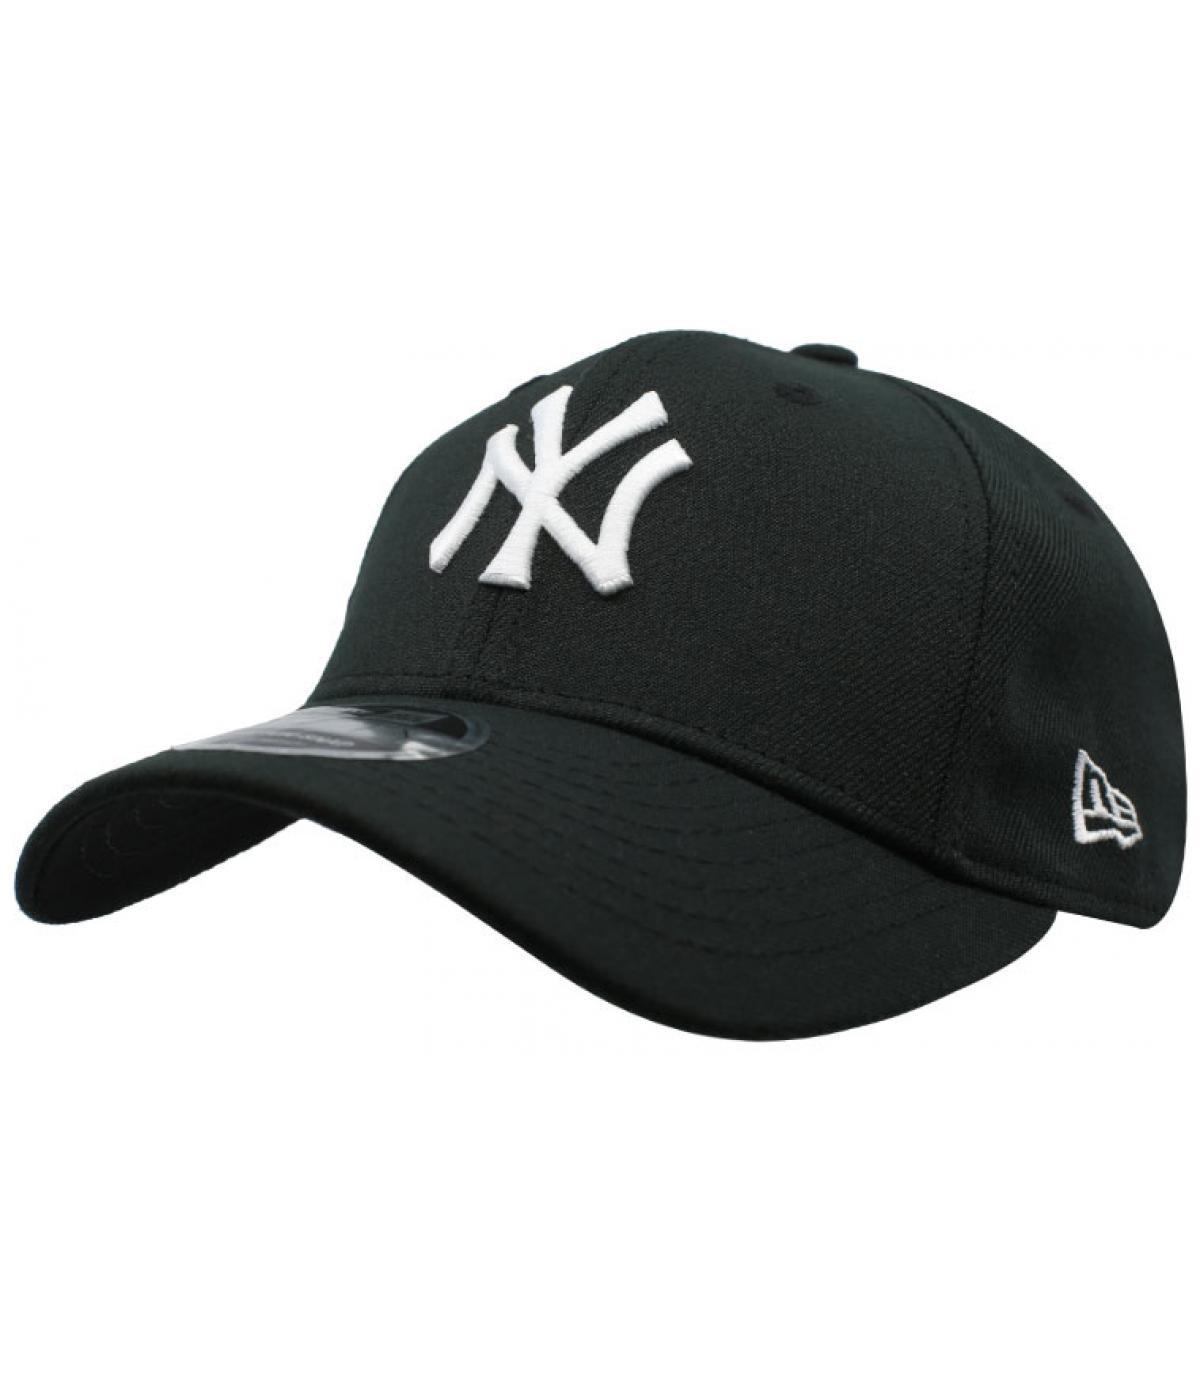 New Era Snapback - Compra venta de New Era Snapback. Primera sombrerería en  línea. Entrega en 48 72horas. e1a2347ac37